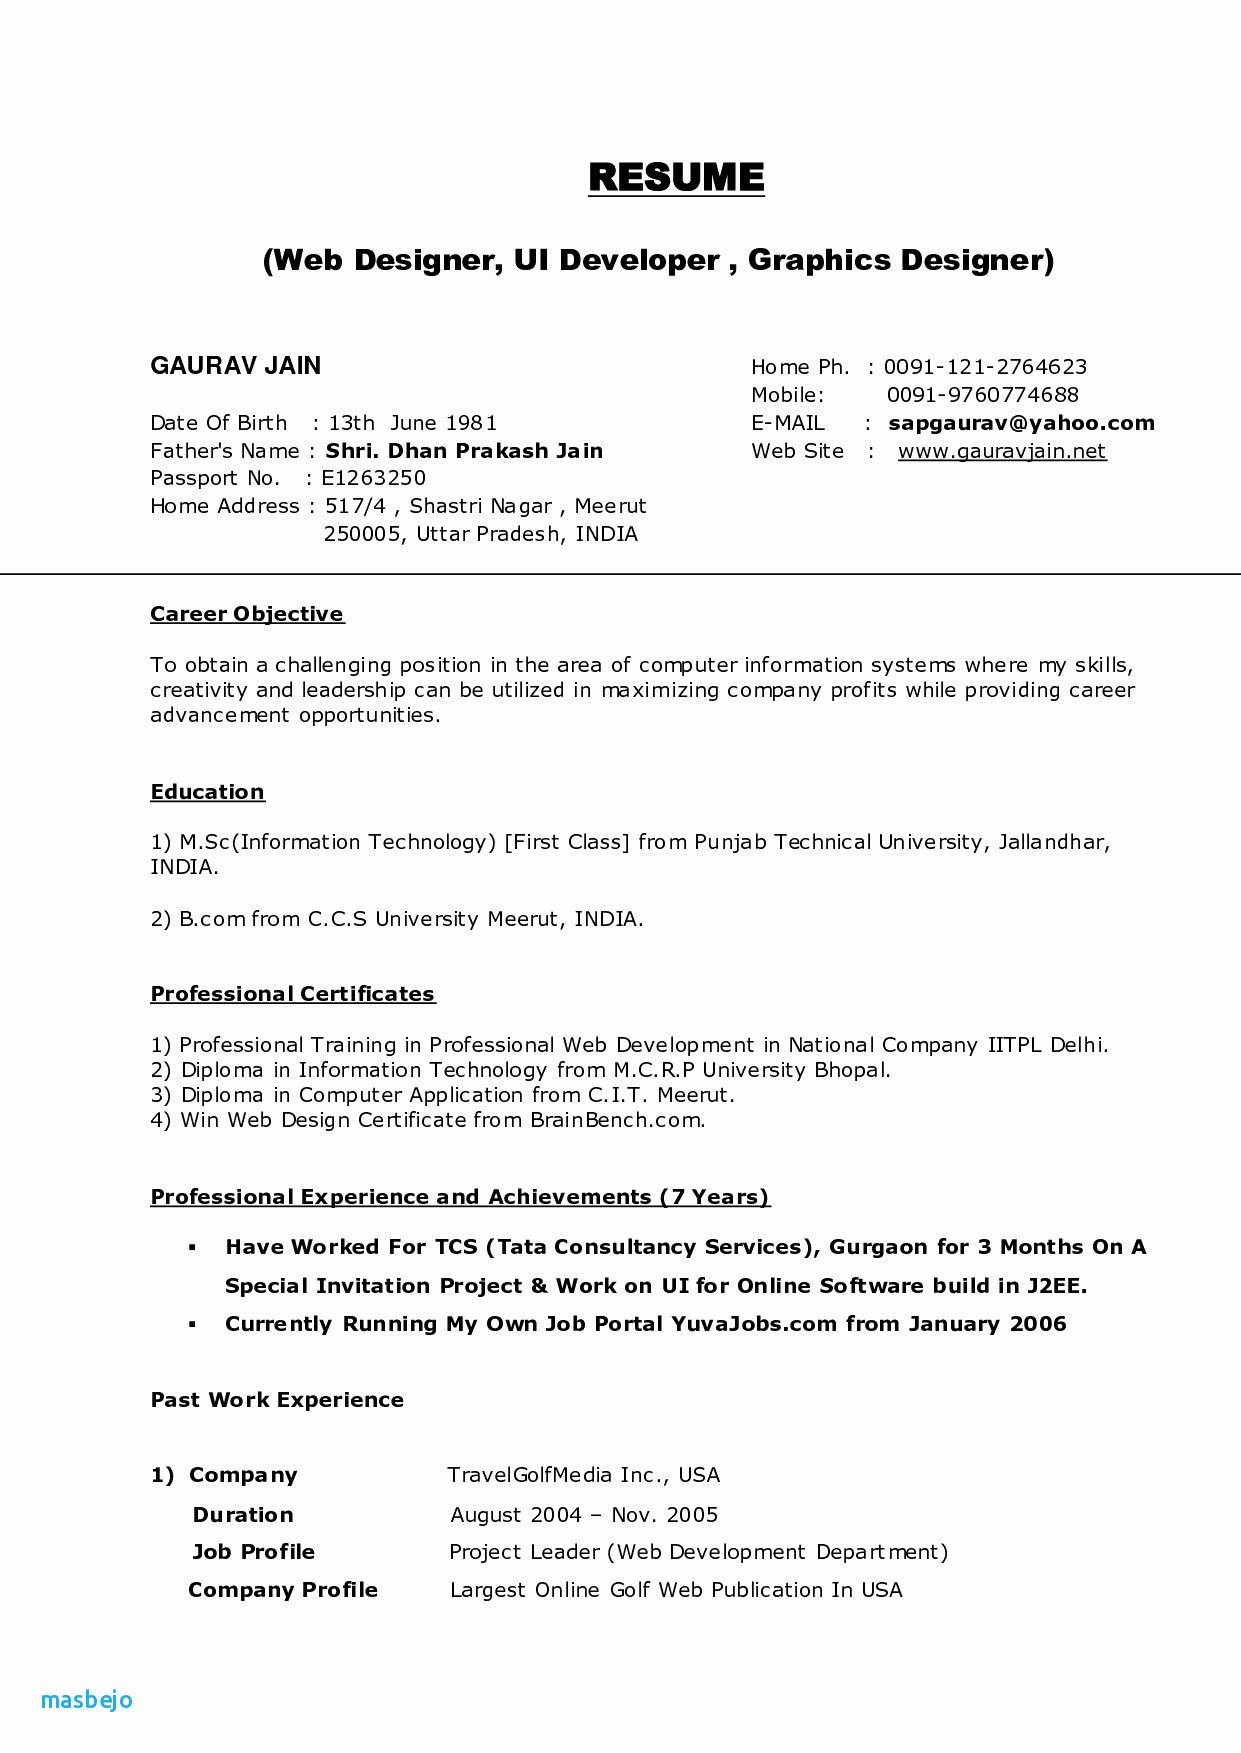 B Com Resume Templates New Photos Web Developer Resume Fresh Pr Resume Template Elegant Dictionarysample Graphic Design Resume Online Resume Job Resume Format